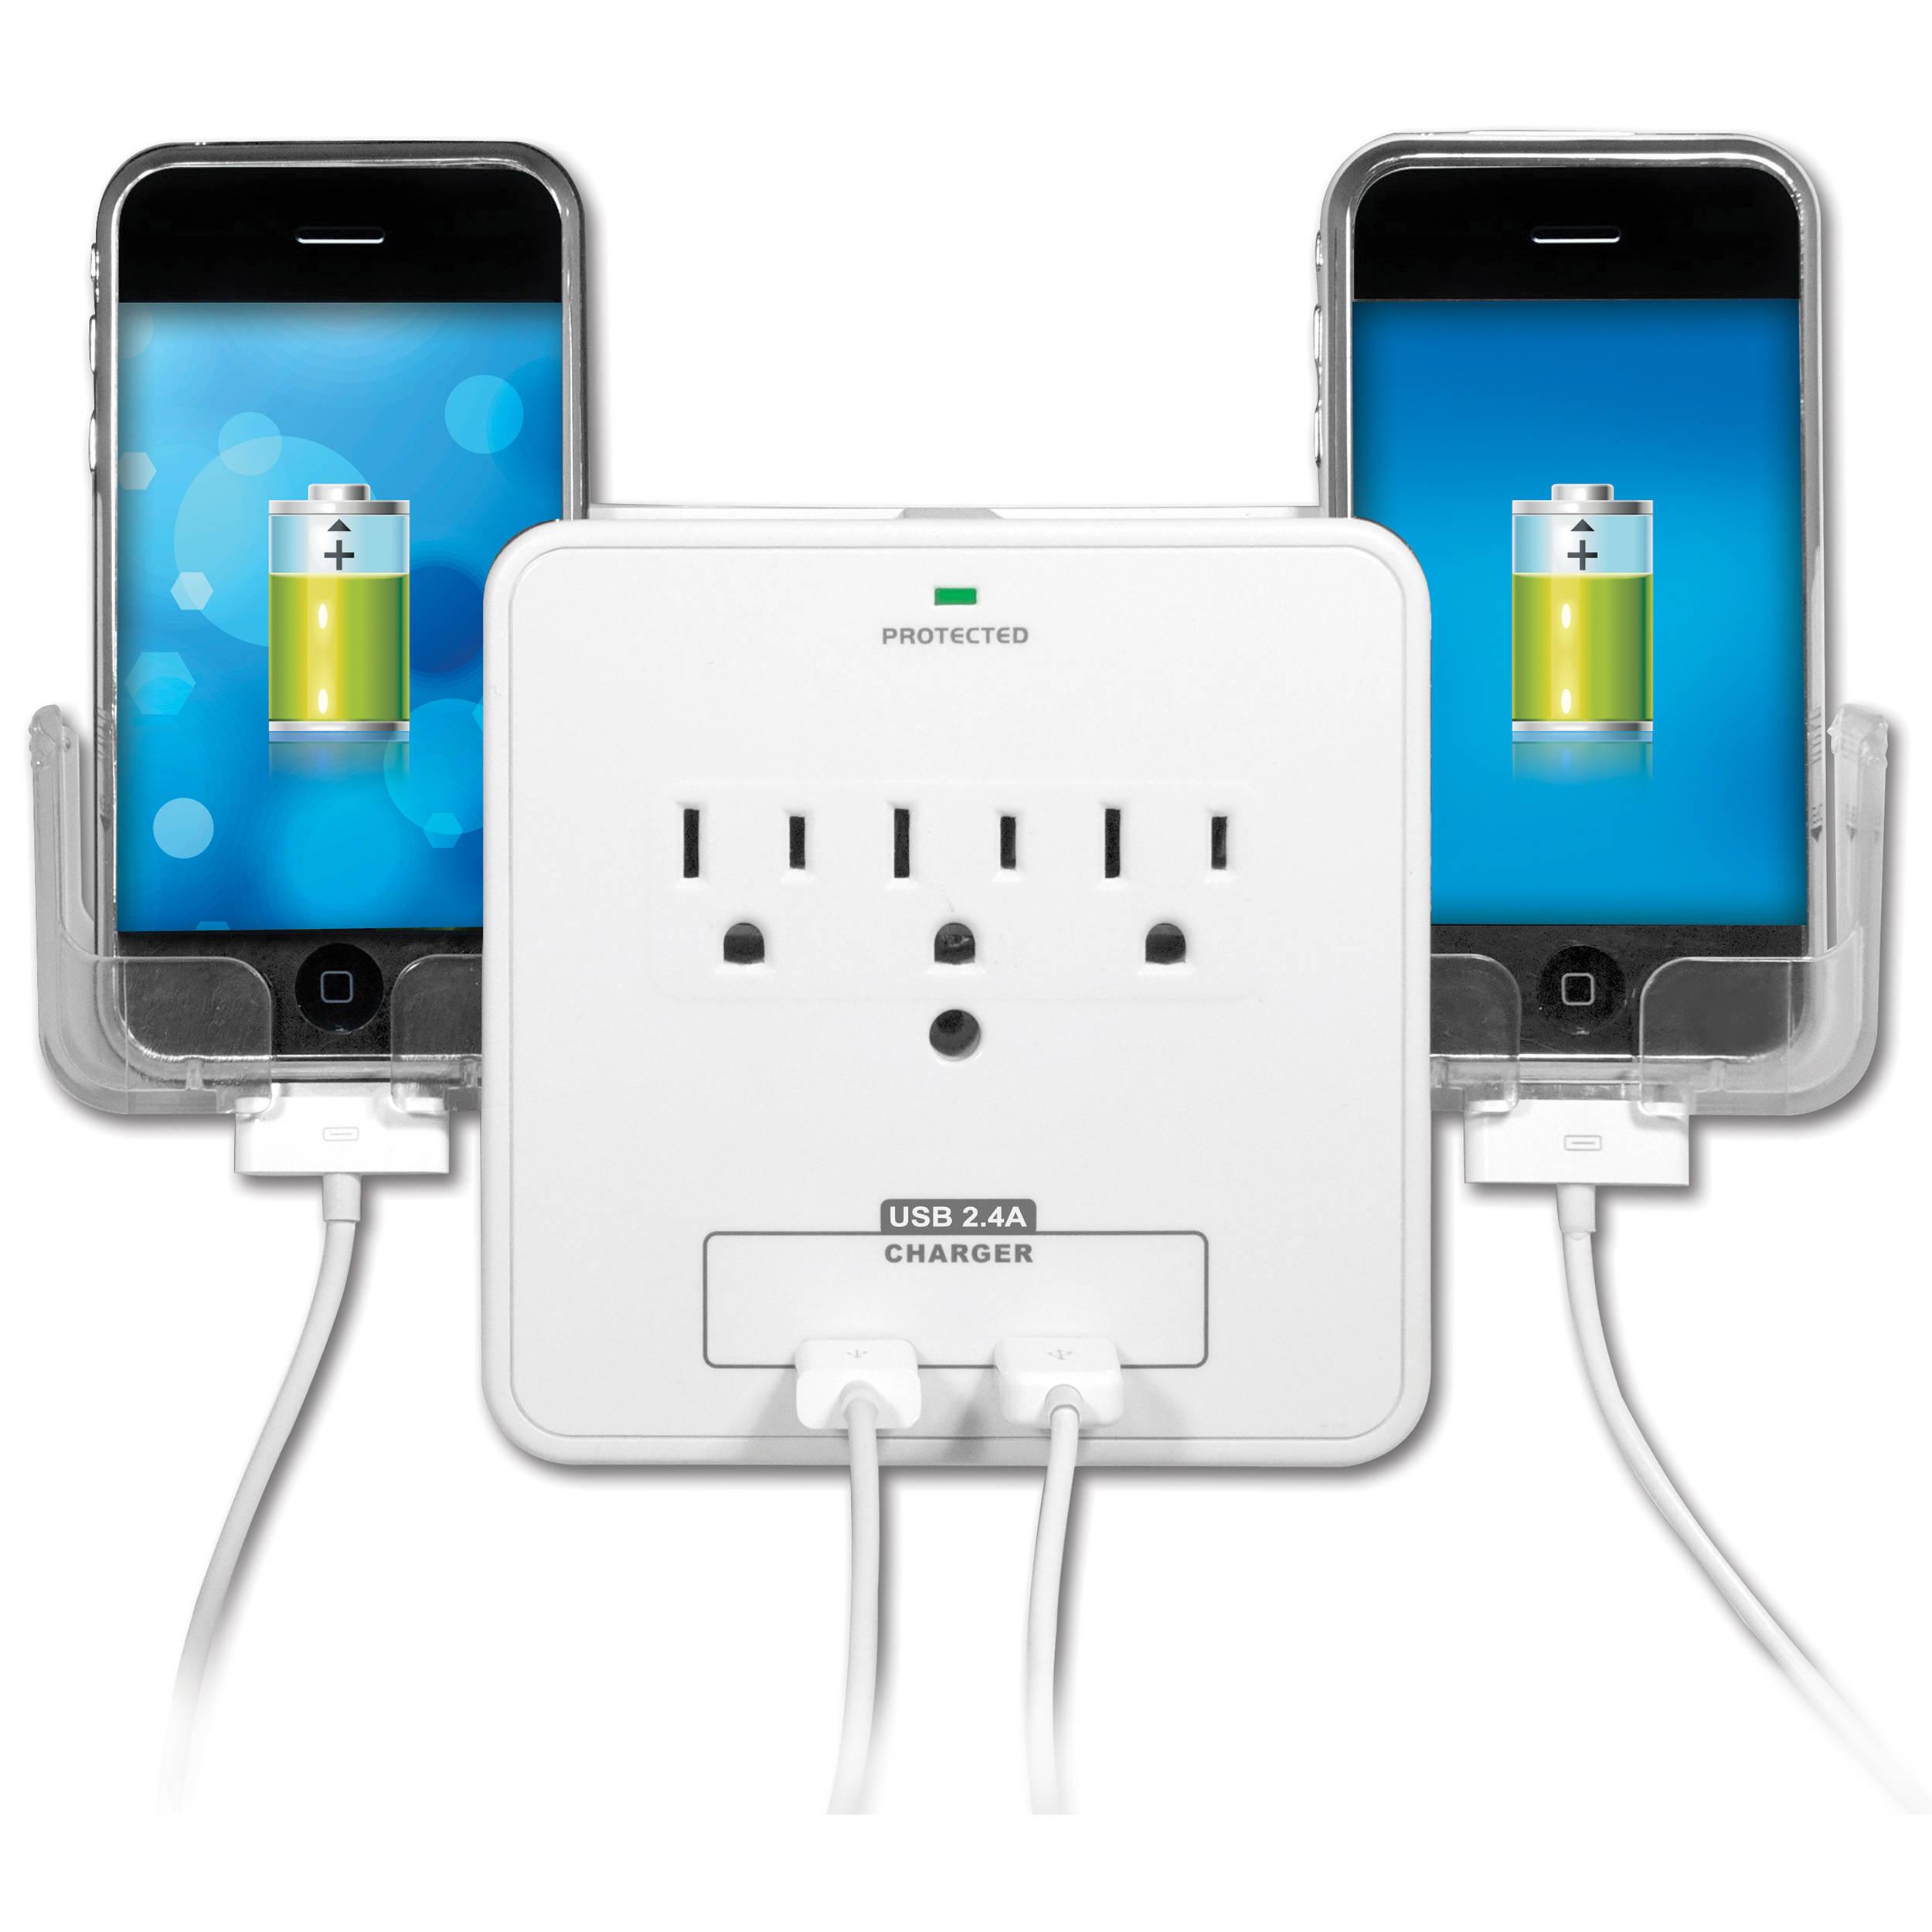 Yubi Power Wall Charging Station Plus Dual Phone Ybw3p2us21ph